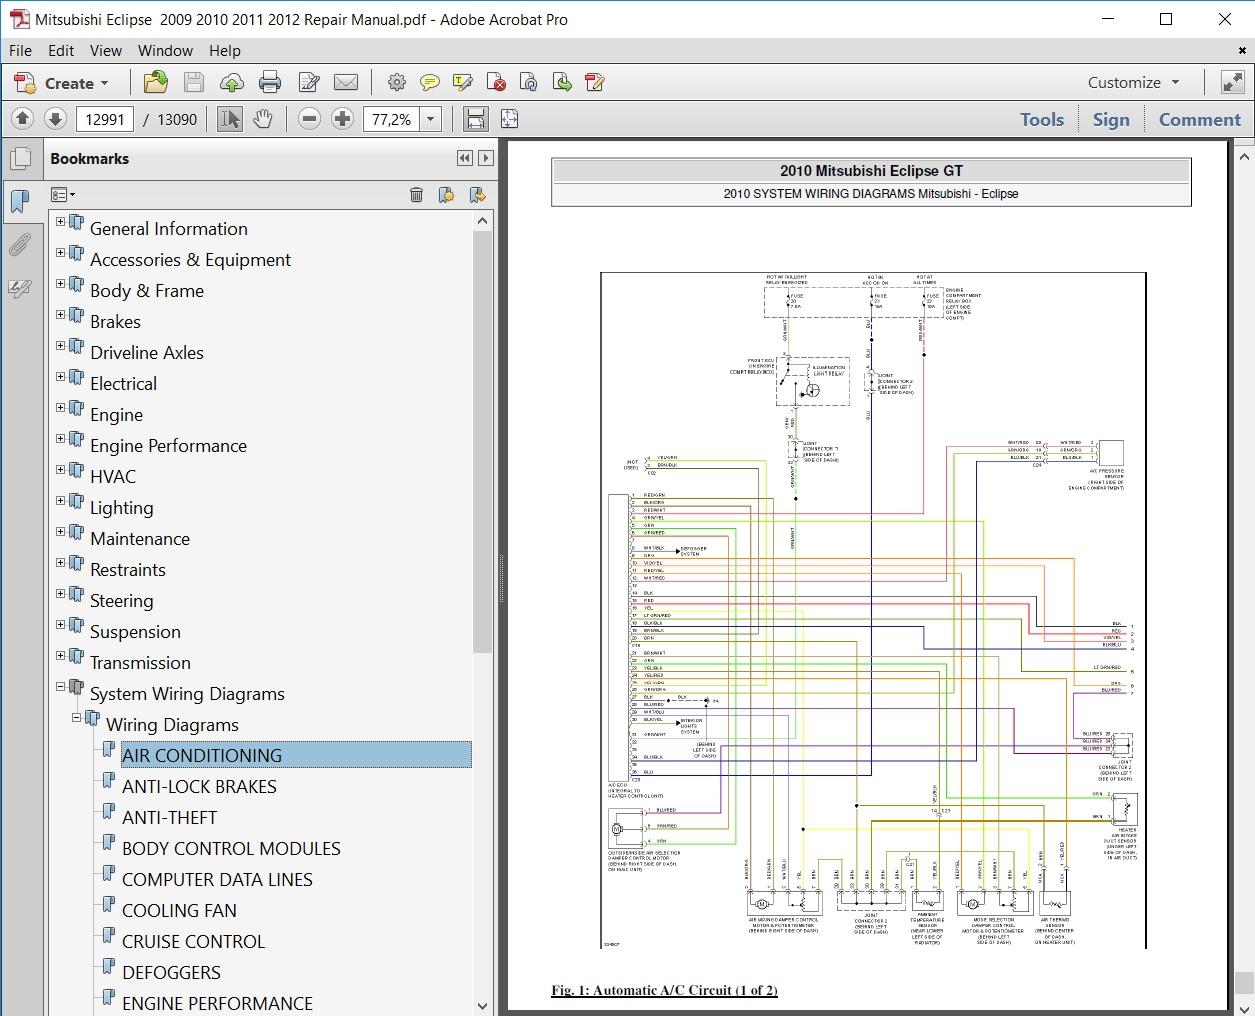 Mitsubishi Eclipse 2009 2010 2011 2012 Repair Manual Transmission Diagrams Service Covers